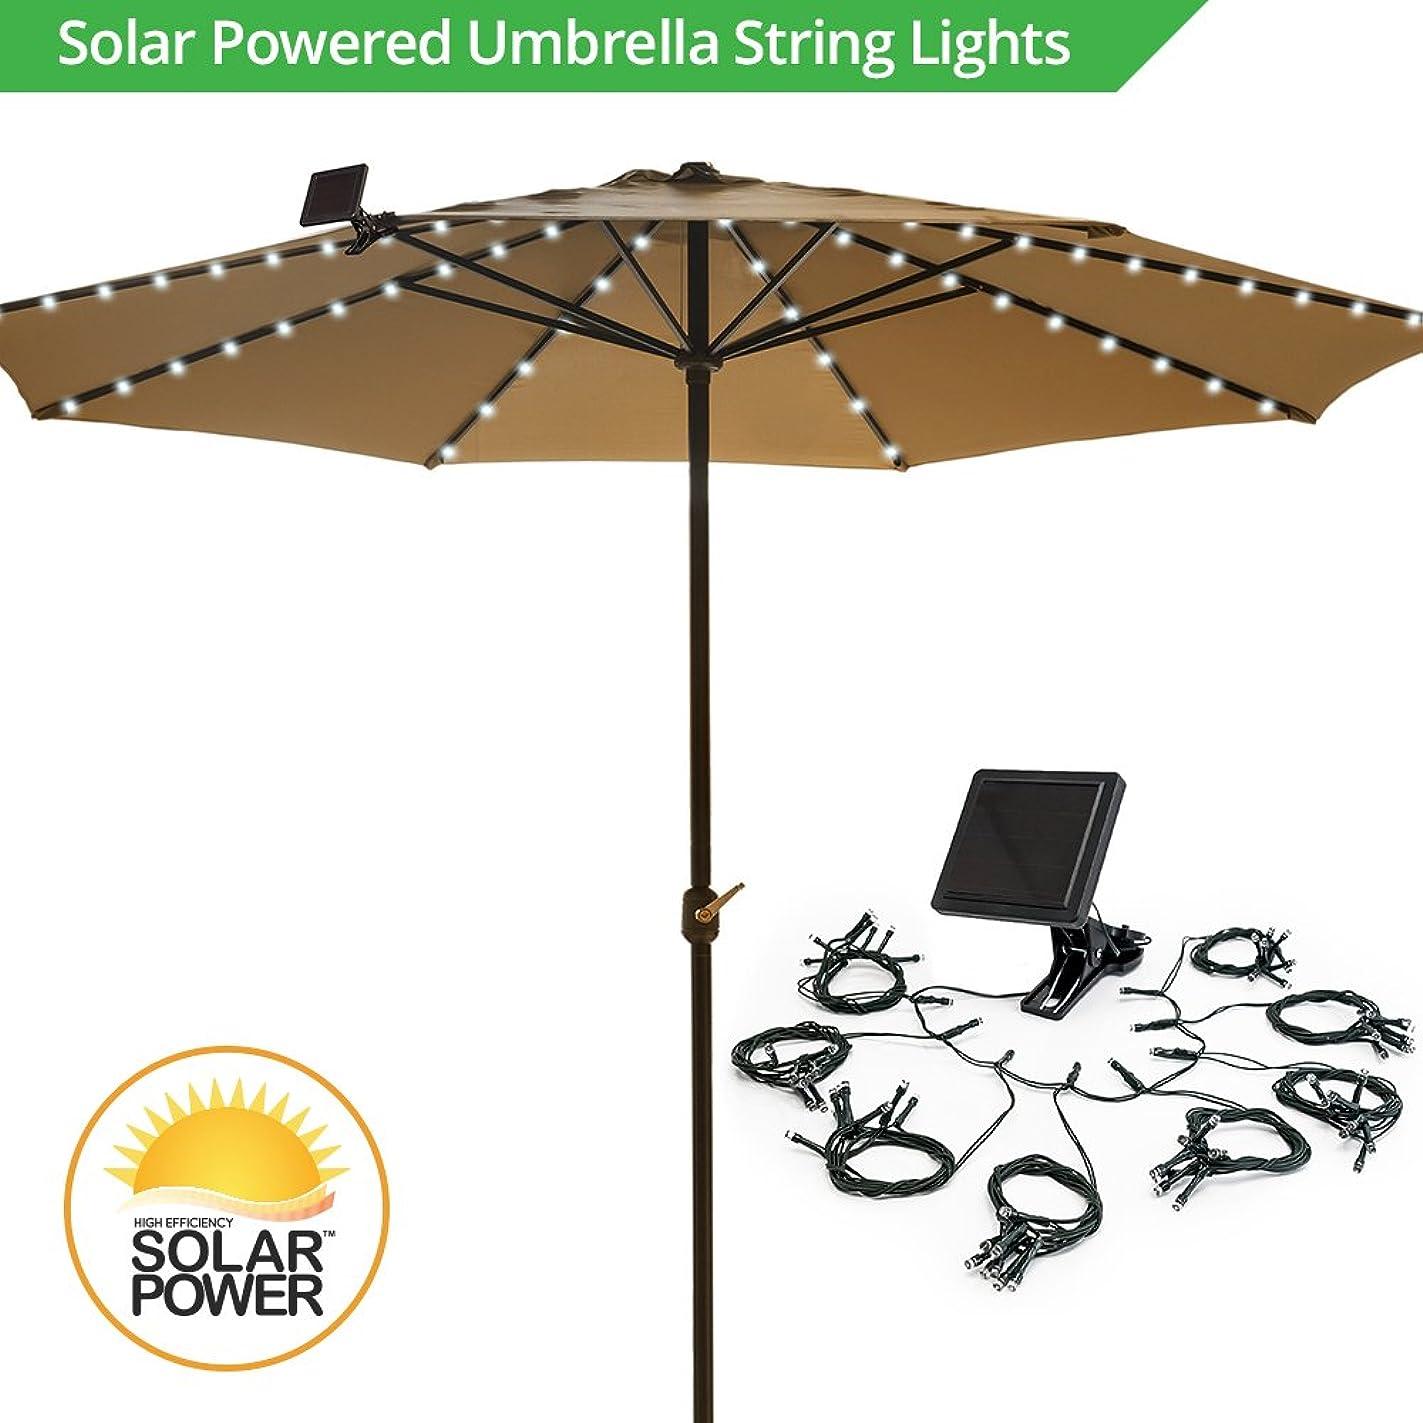 Umbrella Solar String Lights - Cool White - 72 total LEDs, 8 strings, 9 LEDs per string